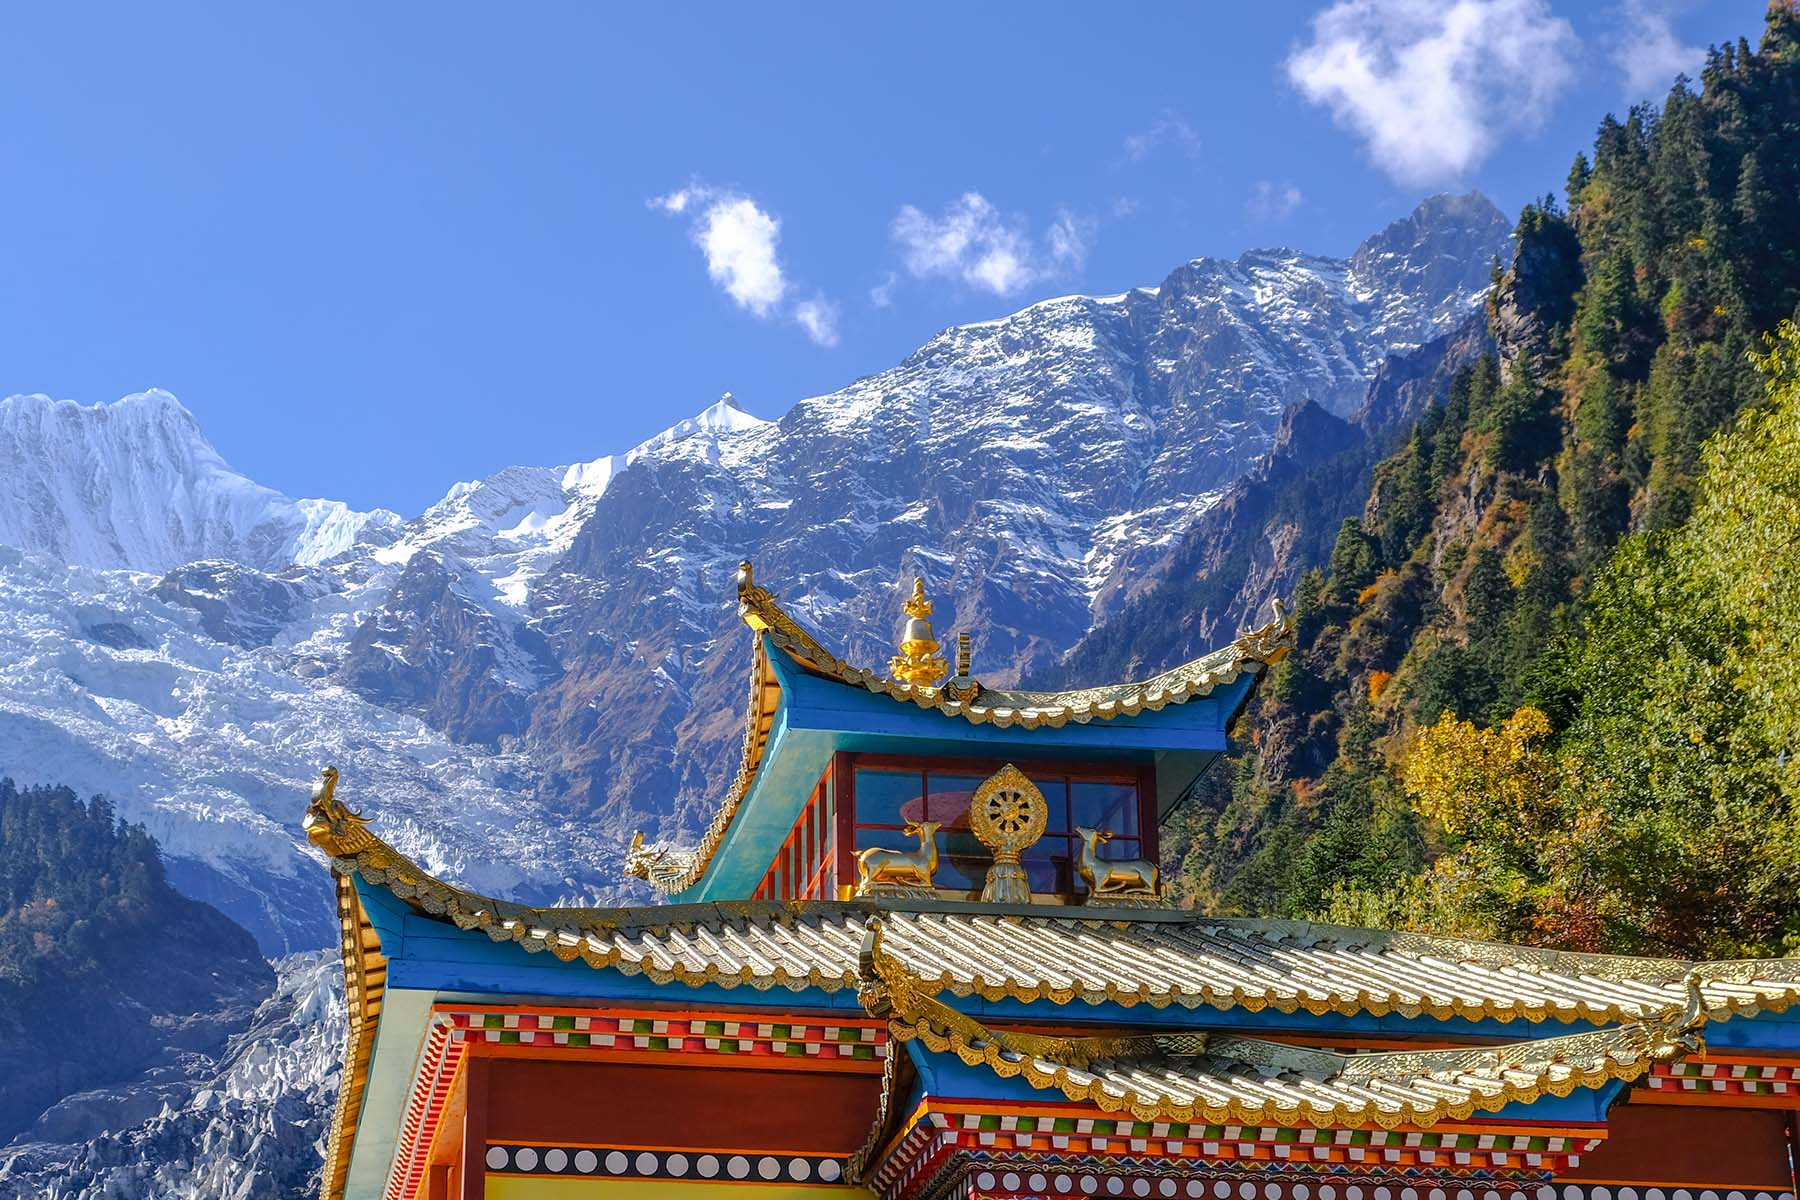 Tempel am Ende des Wanderweges zum Mingyong Gletscher in Yunnan, China im Herbst